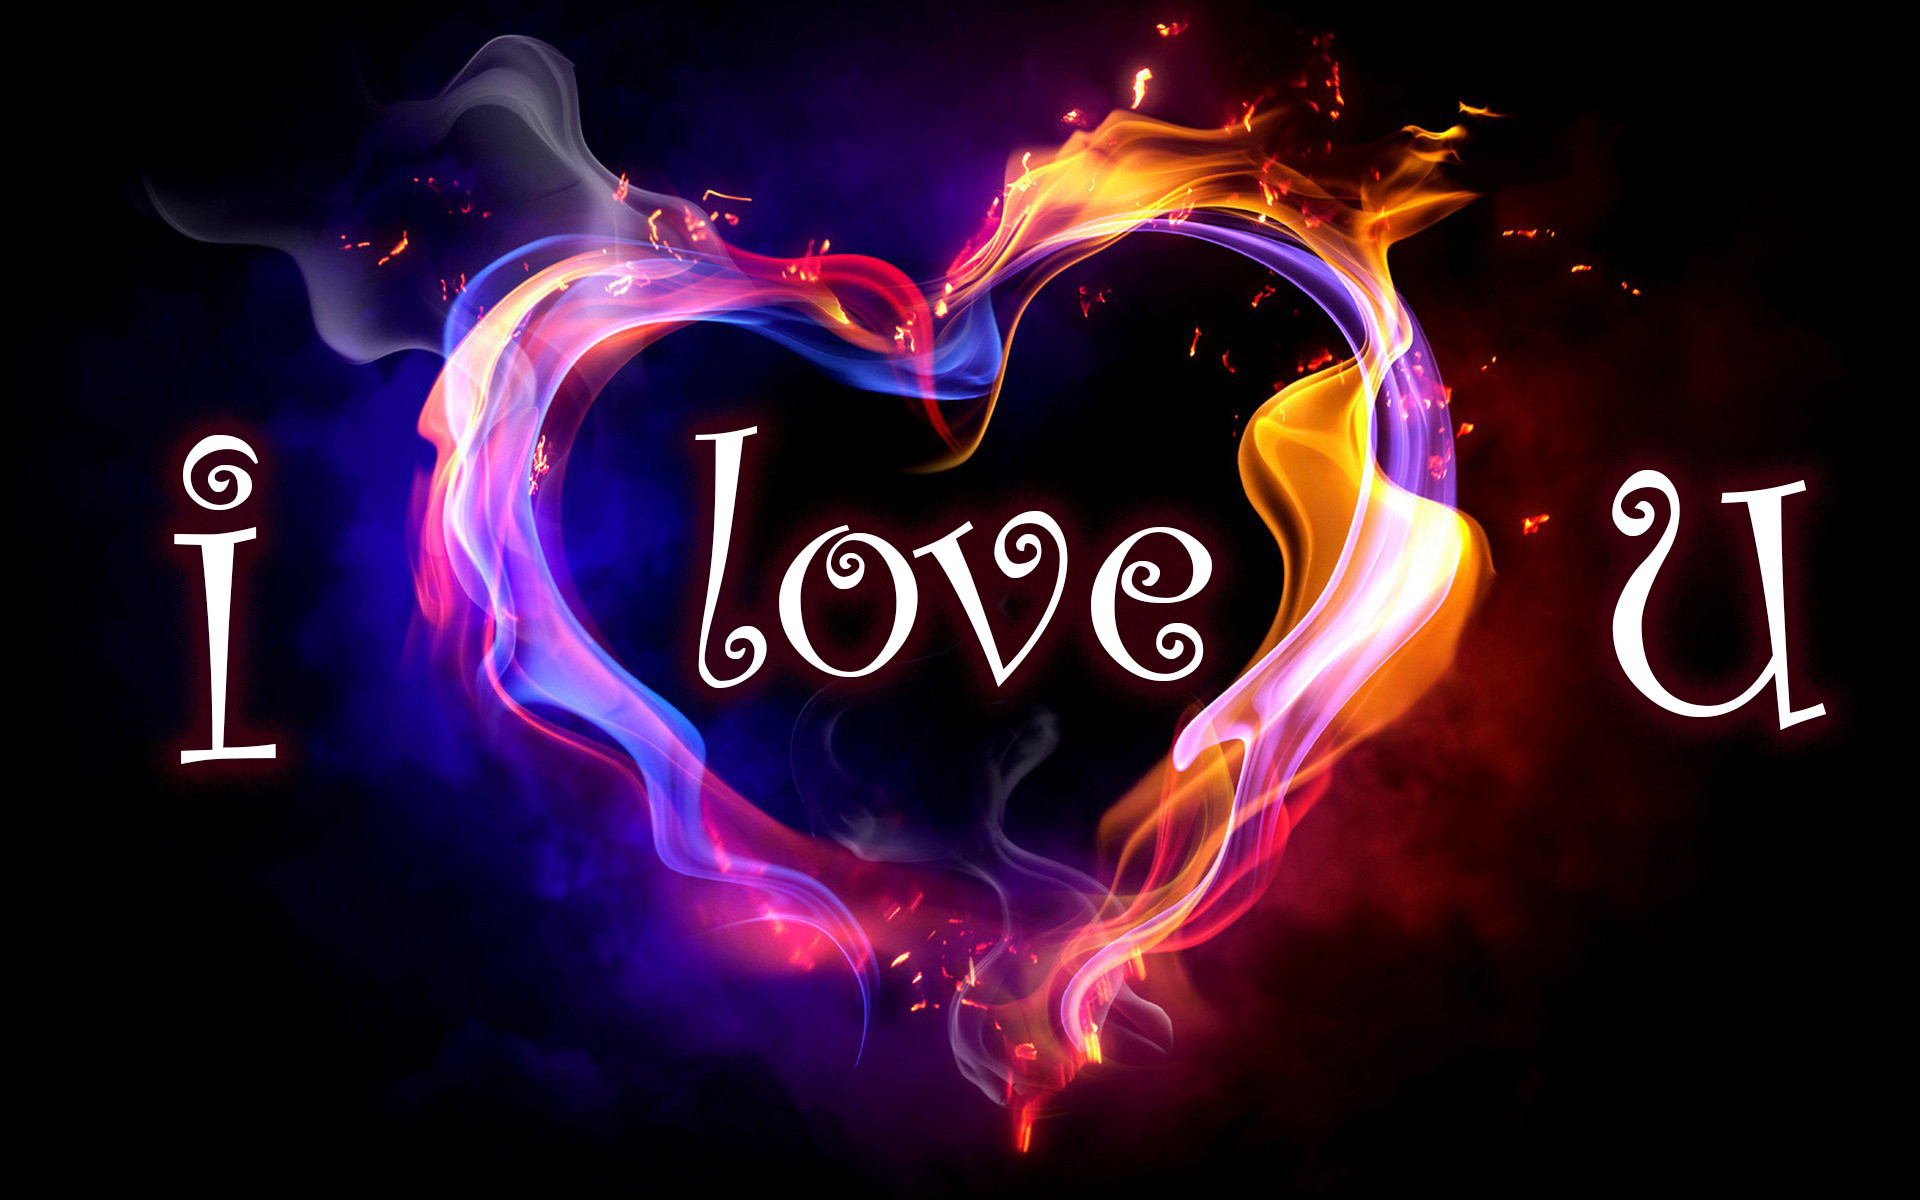 Love Heart Wallpaper Hd Wallpapertag: Cool Love Wallpapers ·① WallpaperTag